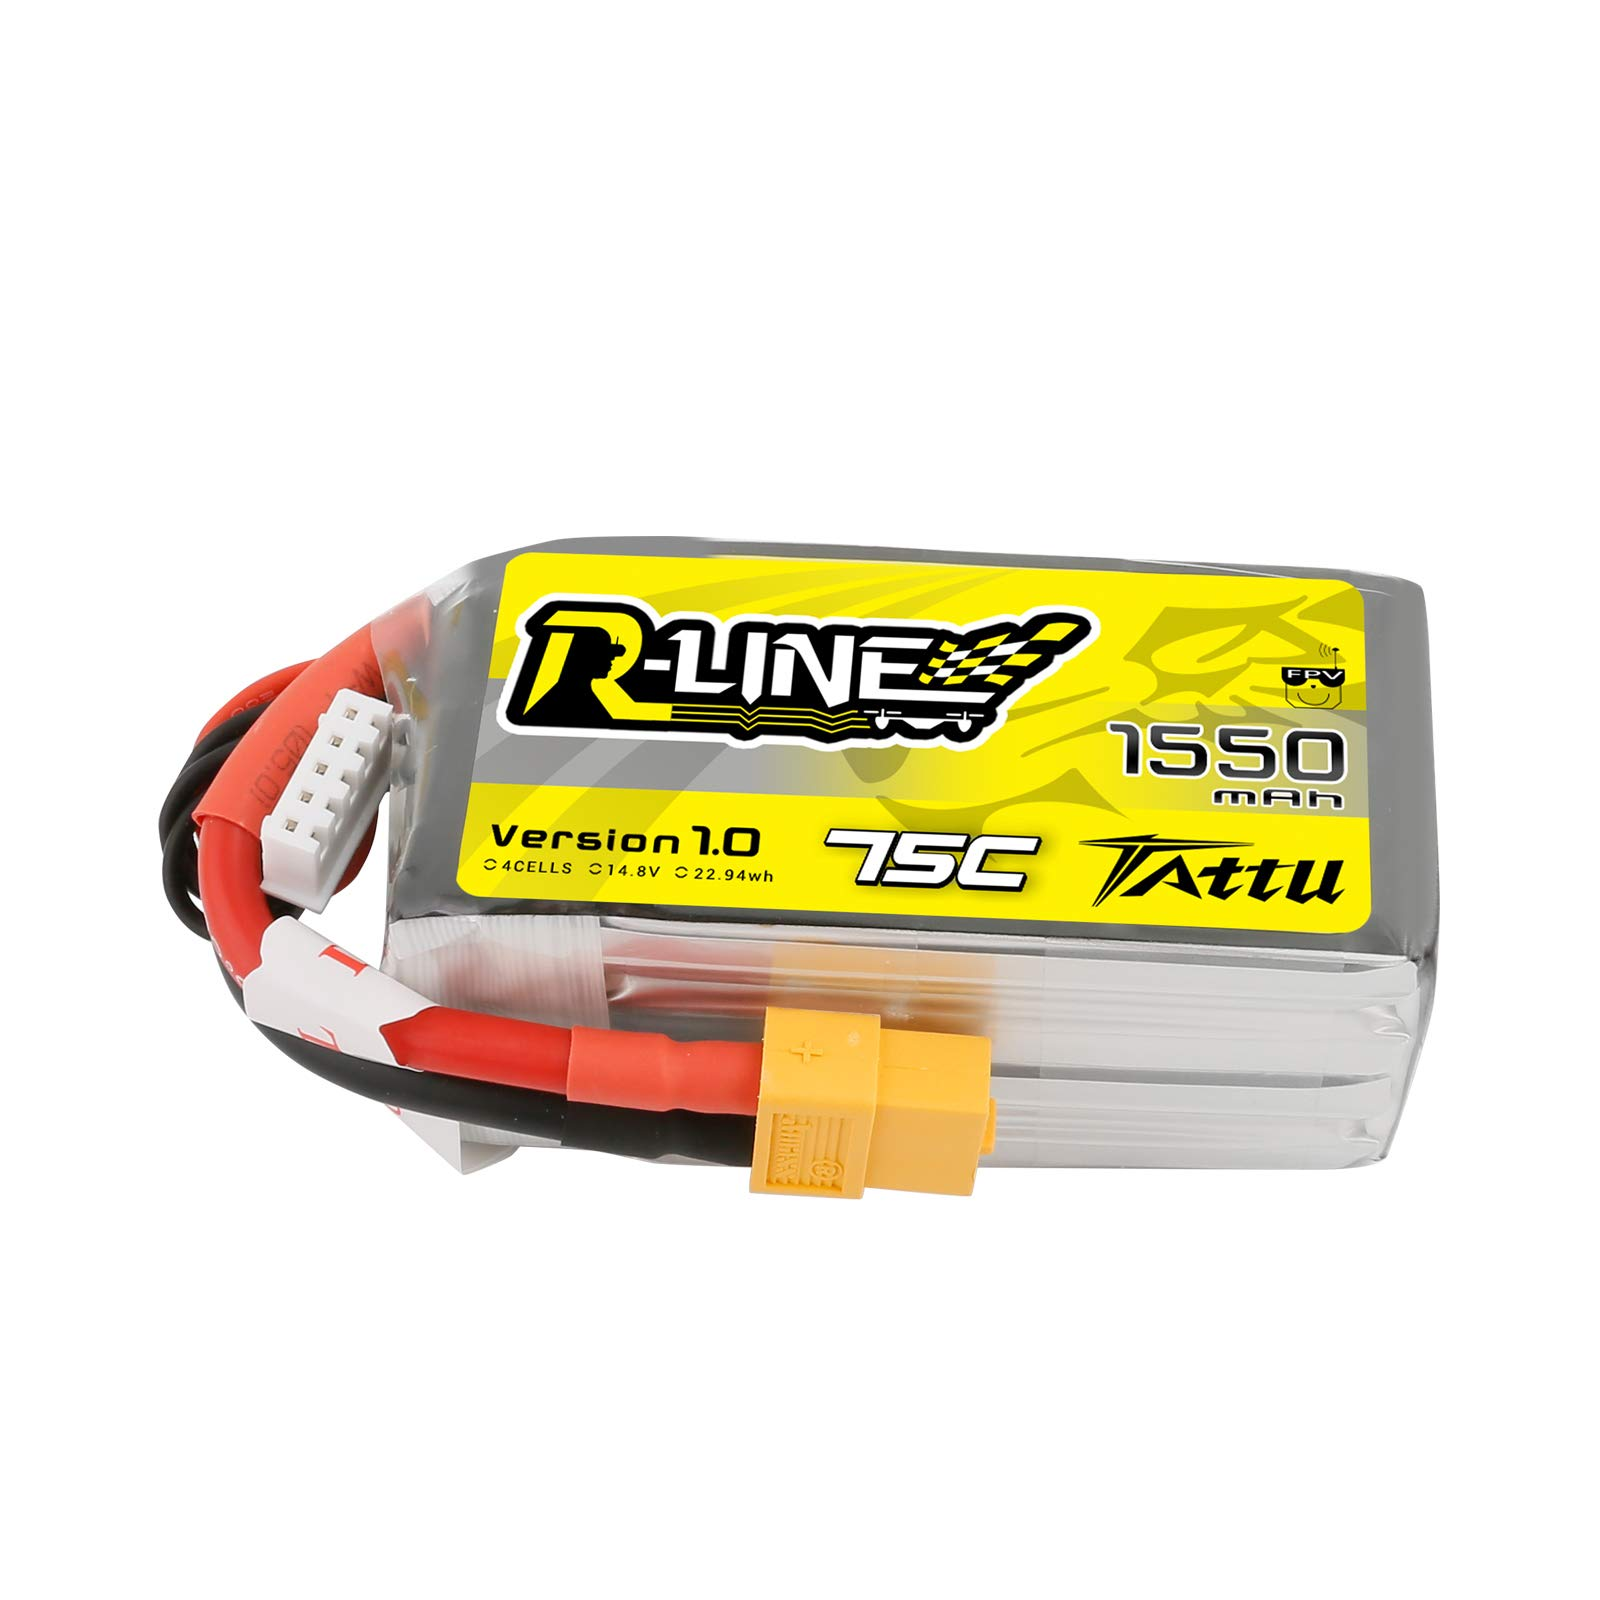 Tattu 14.8V 75C 4S 1550mAh R-Line LiPo Battery Pack with XT60 Plug for FPV Racing QAV 250